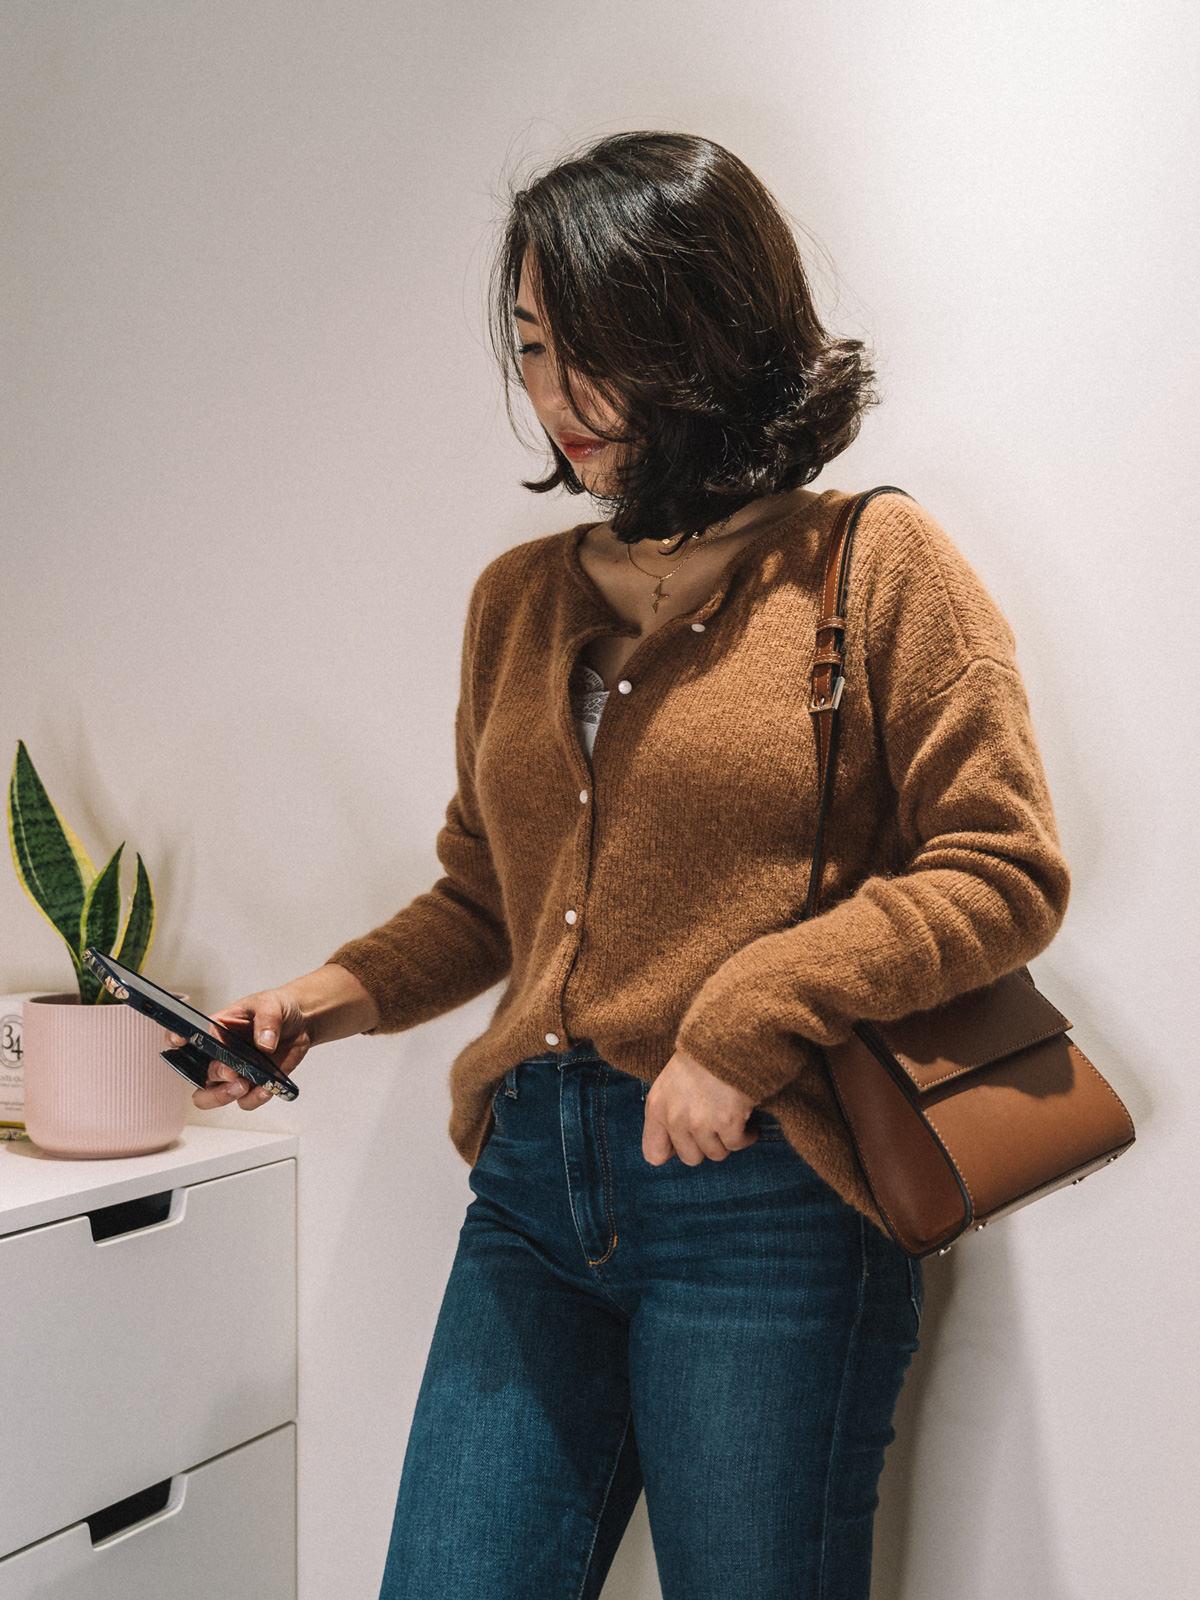 【Unboxing】法國品牌Sezane 2件秋冬上衣開箱實穿&尺寸建議:Gaspard Jumper、Mackenzie Shirt